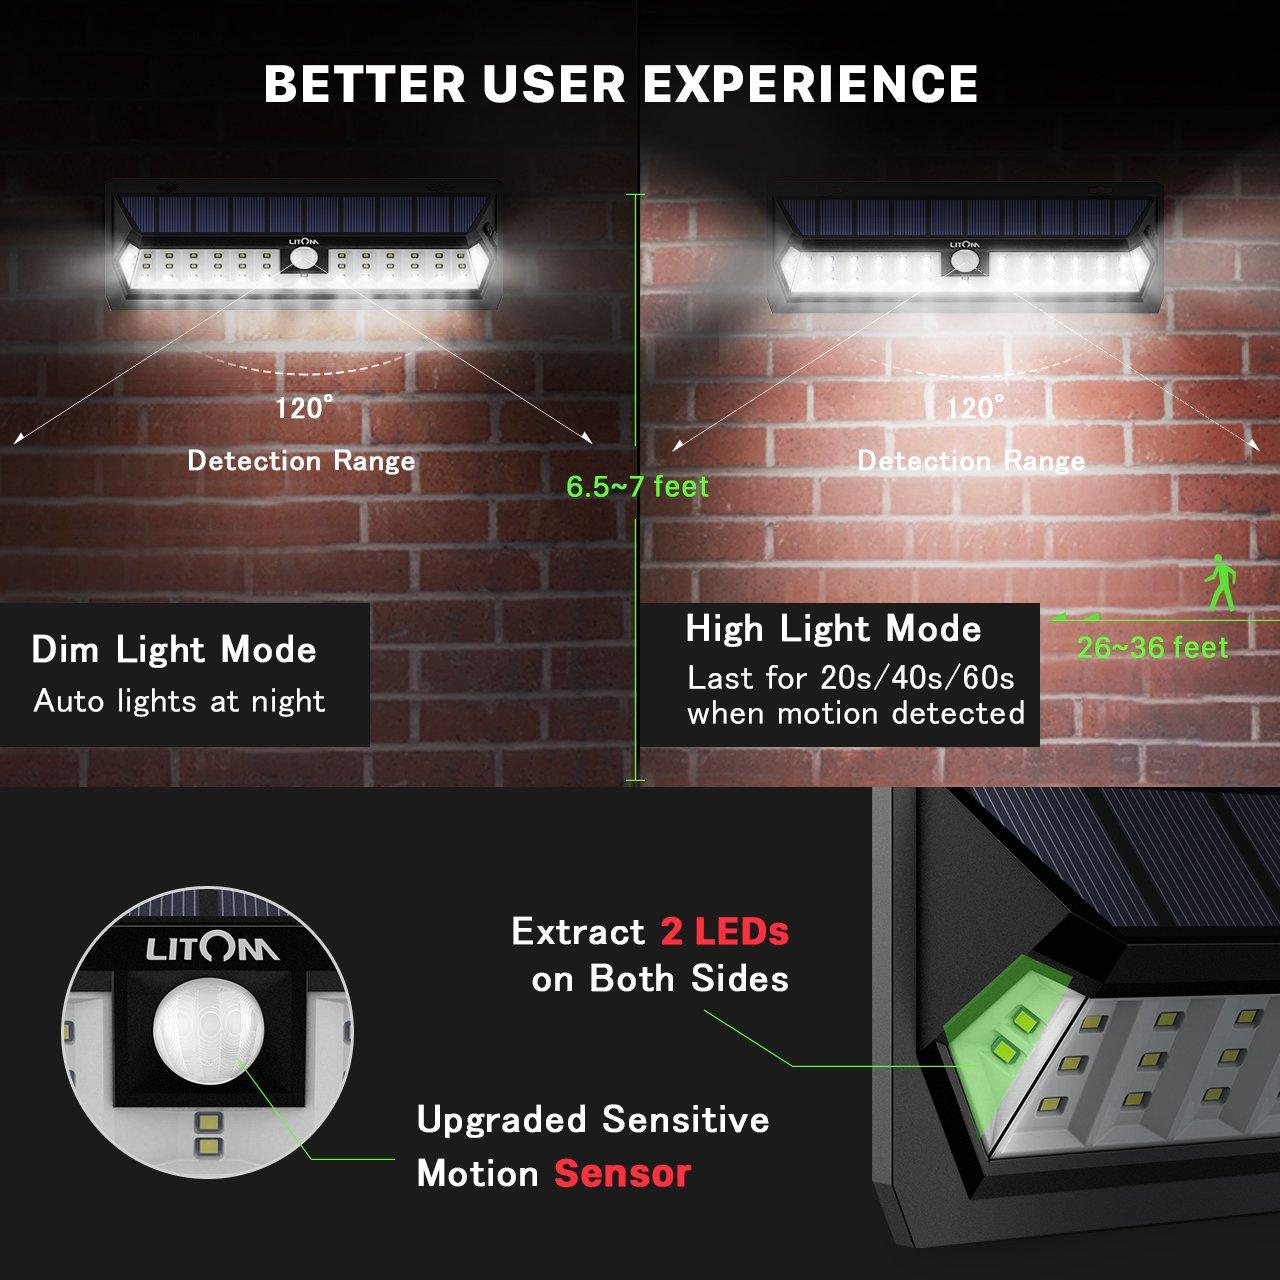 LITOM Solar Lights Outdoor 42 LED, Adjustable Lighting Time Solar Motion Sensor Light with 270° Wide Angle and Waterproof Design, Wireless Solar Lighting for Front Door, Yard, Garage, Deck (2 Pack) by Litom (Image #3)